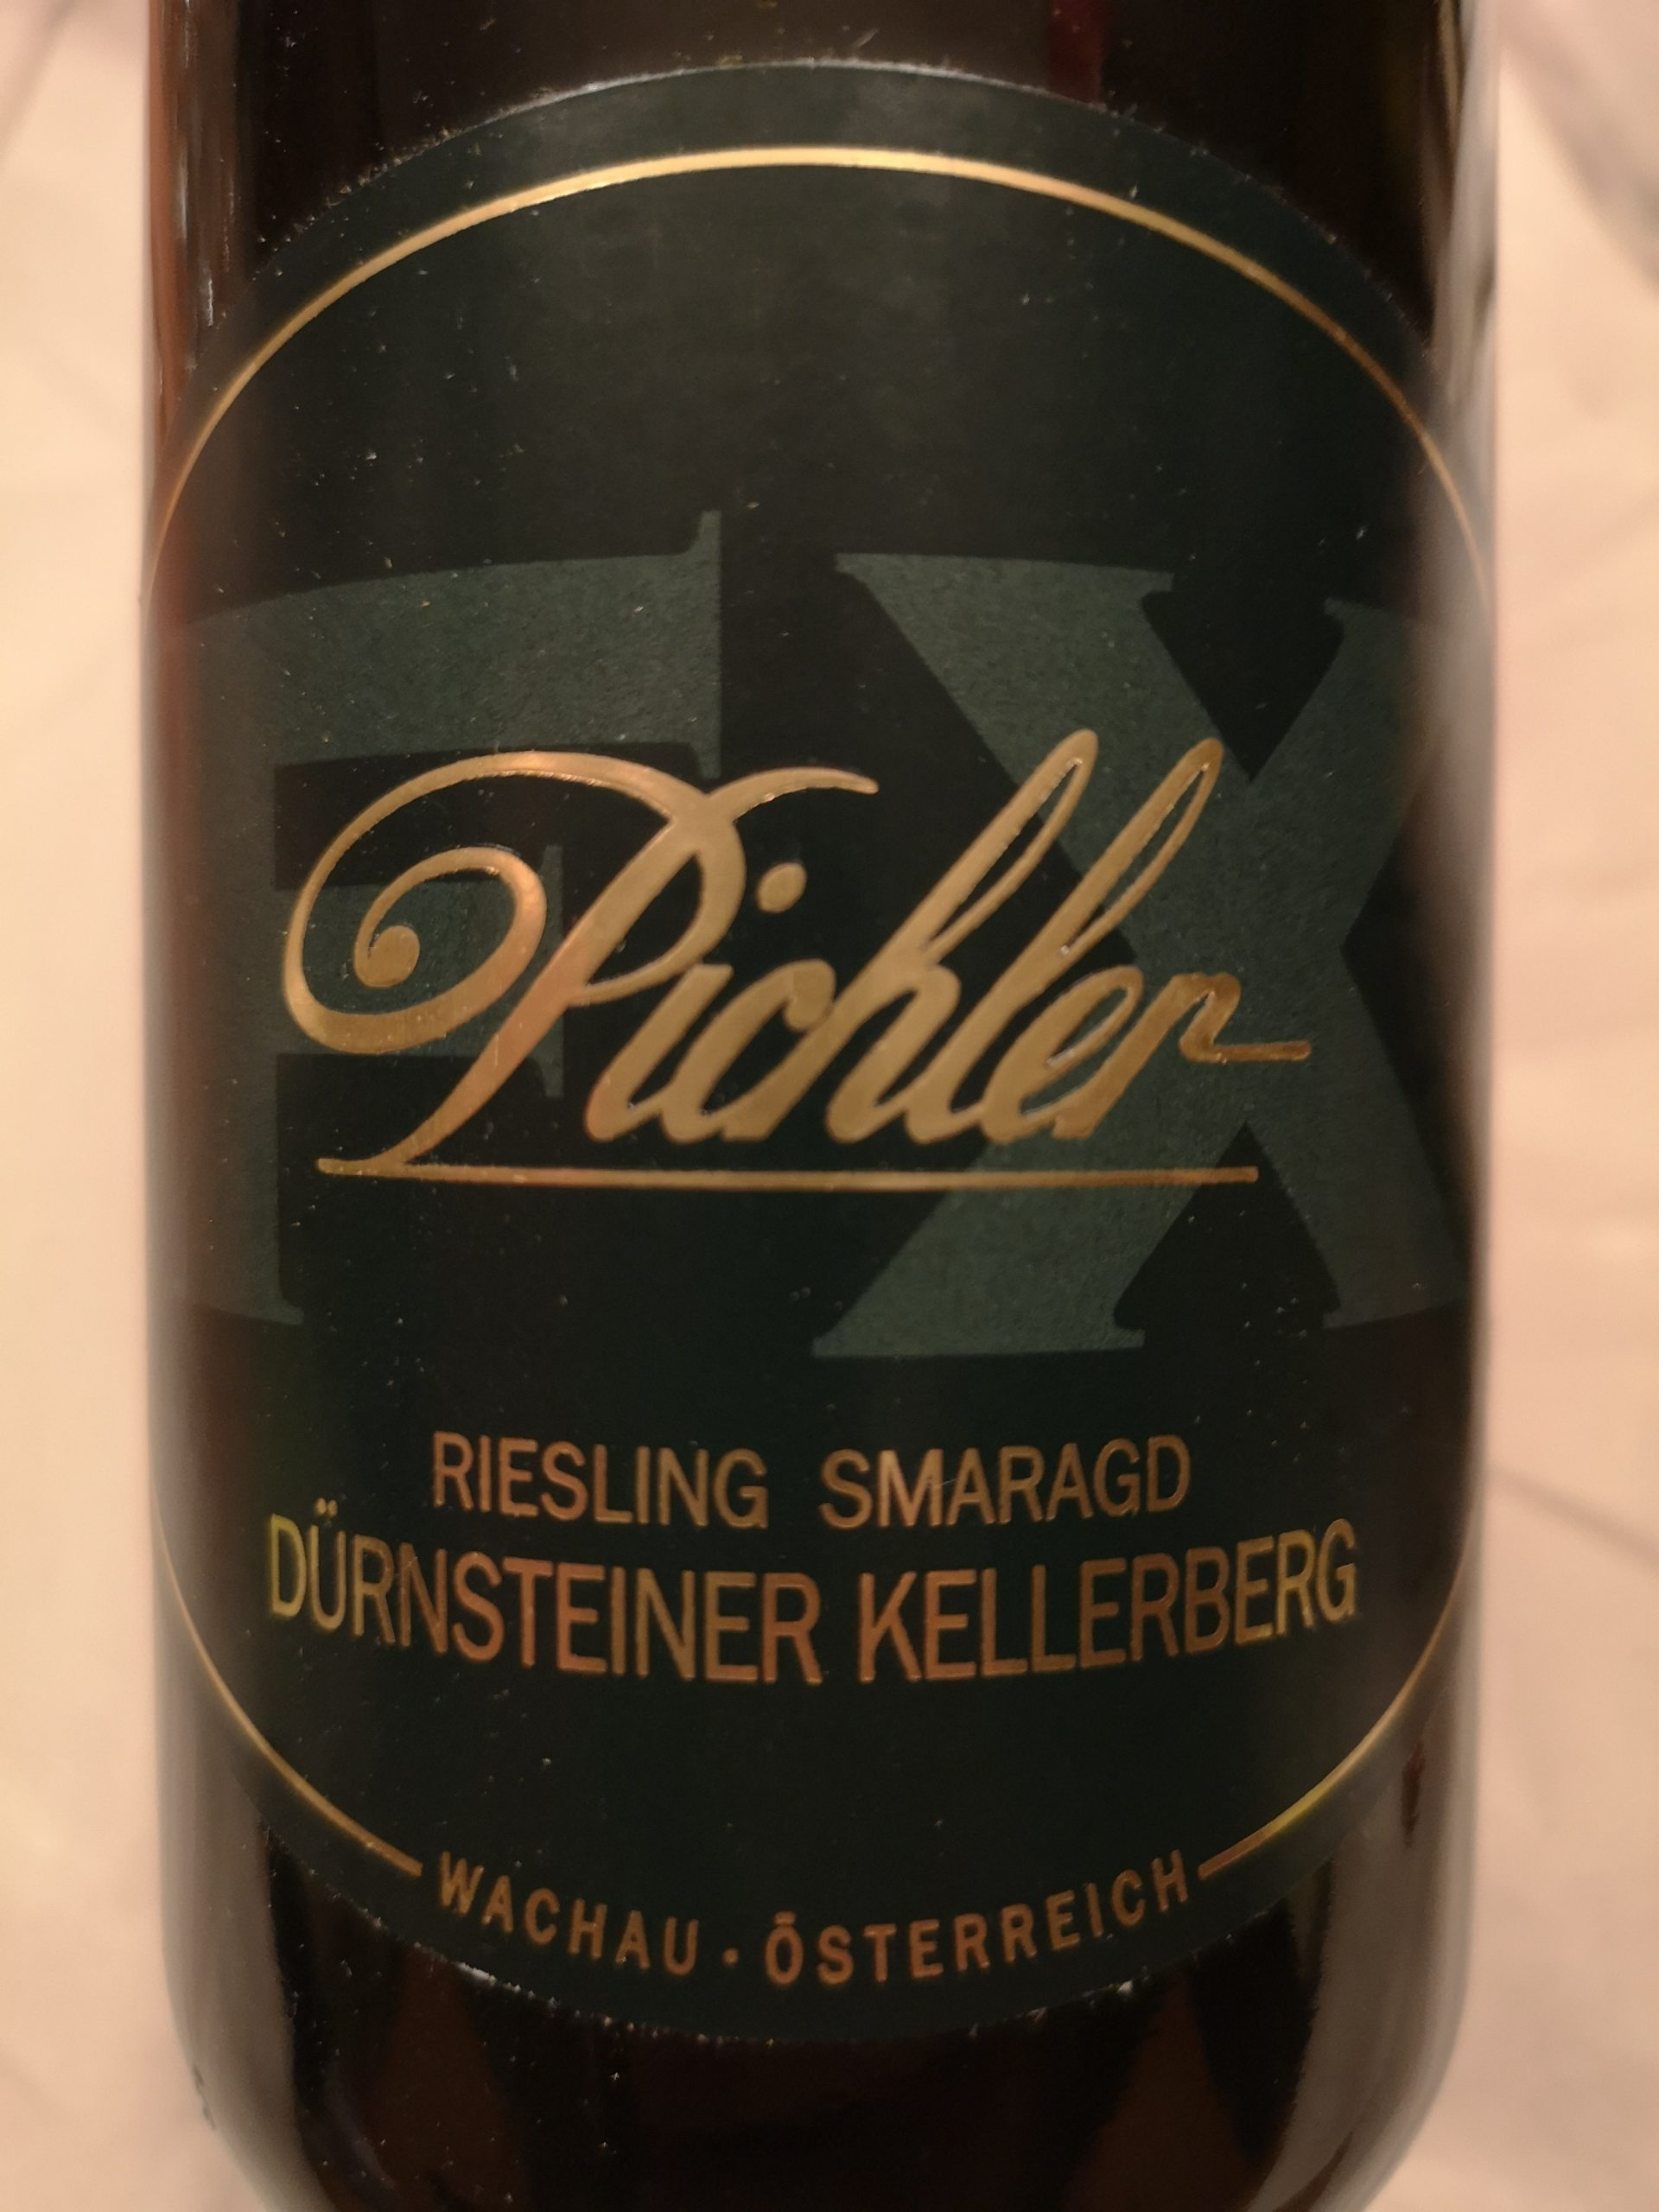 2012 Riesling Dürnsteiner Kellerberg Smaragd | F.X. Pichler